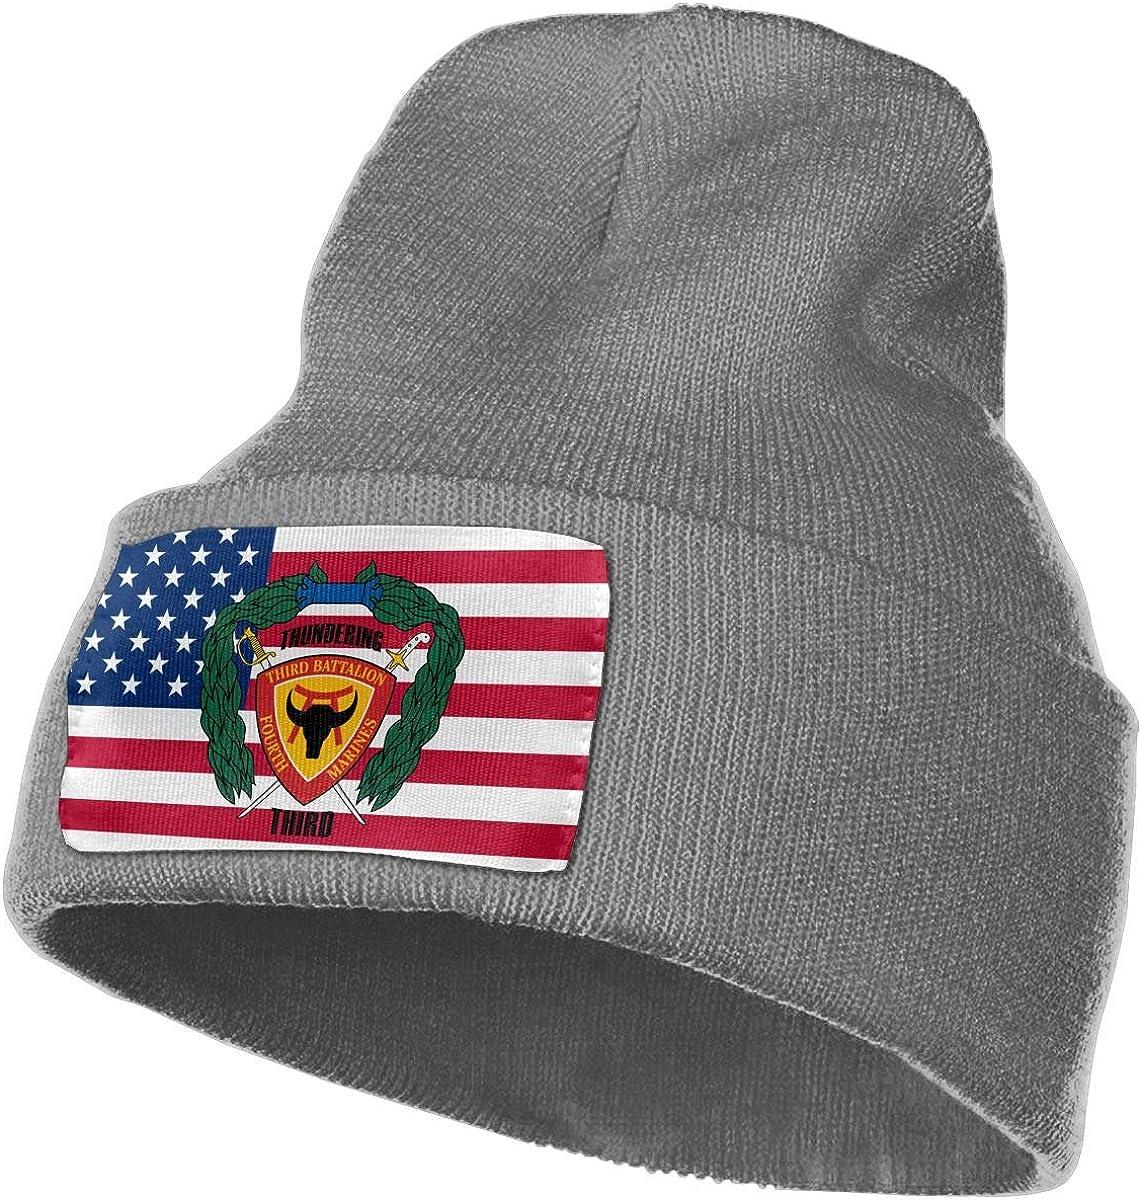 3rd Battalion 4th Marines Men/&Women Warm Winter Knit Plain Beanie Hat Skull Cap Acrylic Knit Cuff Hat